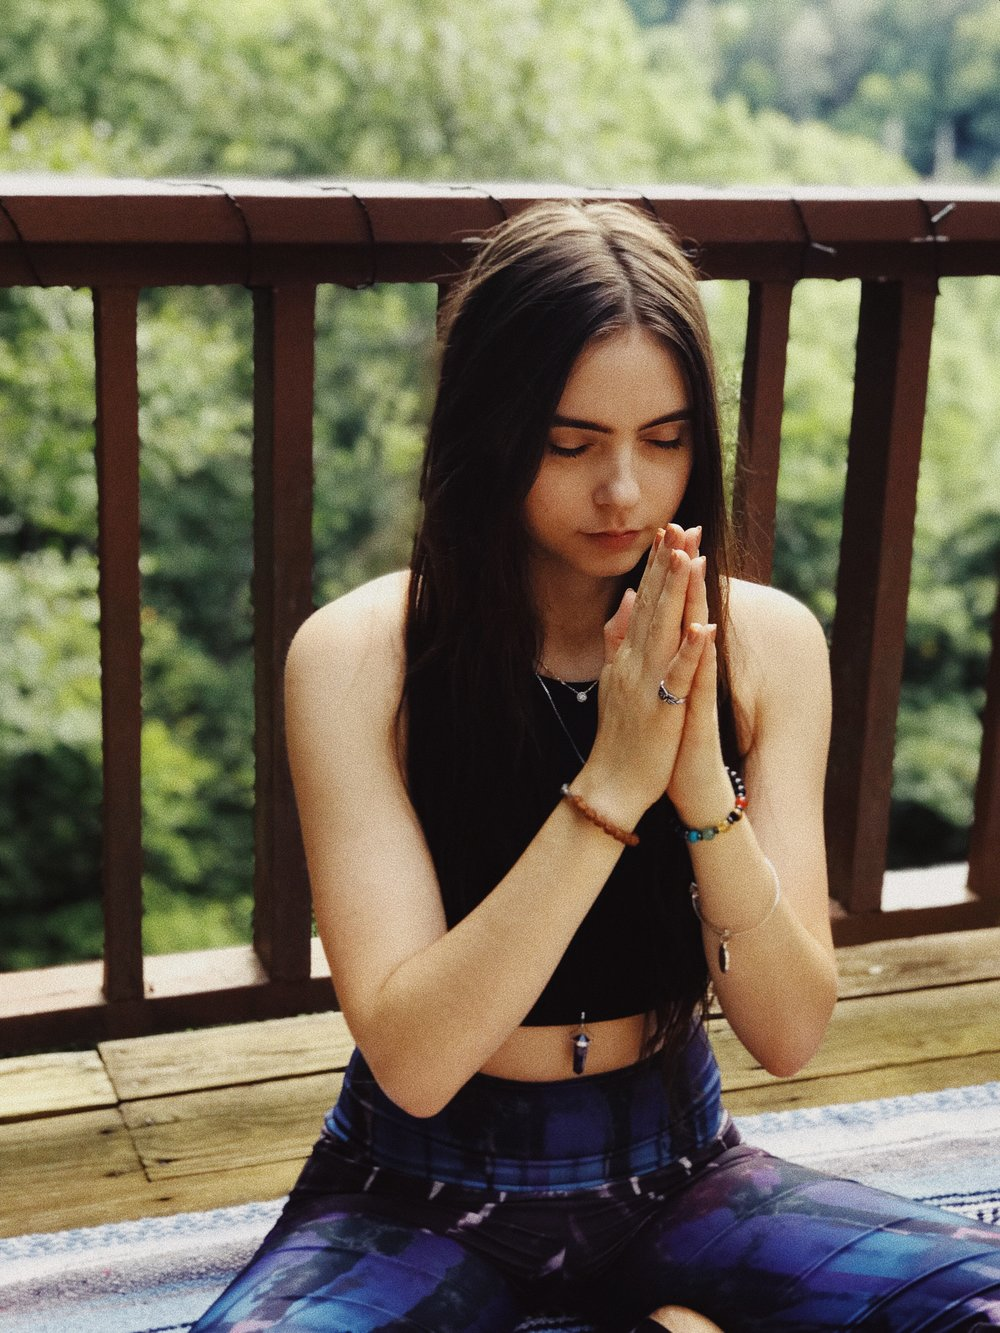 yoga, meditation, yoga for beginners, meditation for beginners, mindfulness, mindfulness for beginners, yin yoga, restorative yoga, yoga nidra, namaste